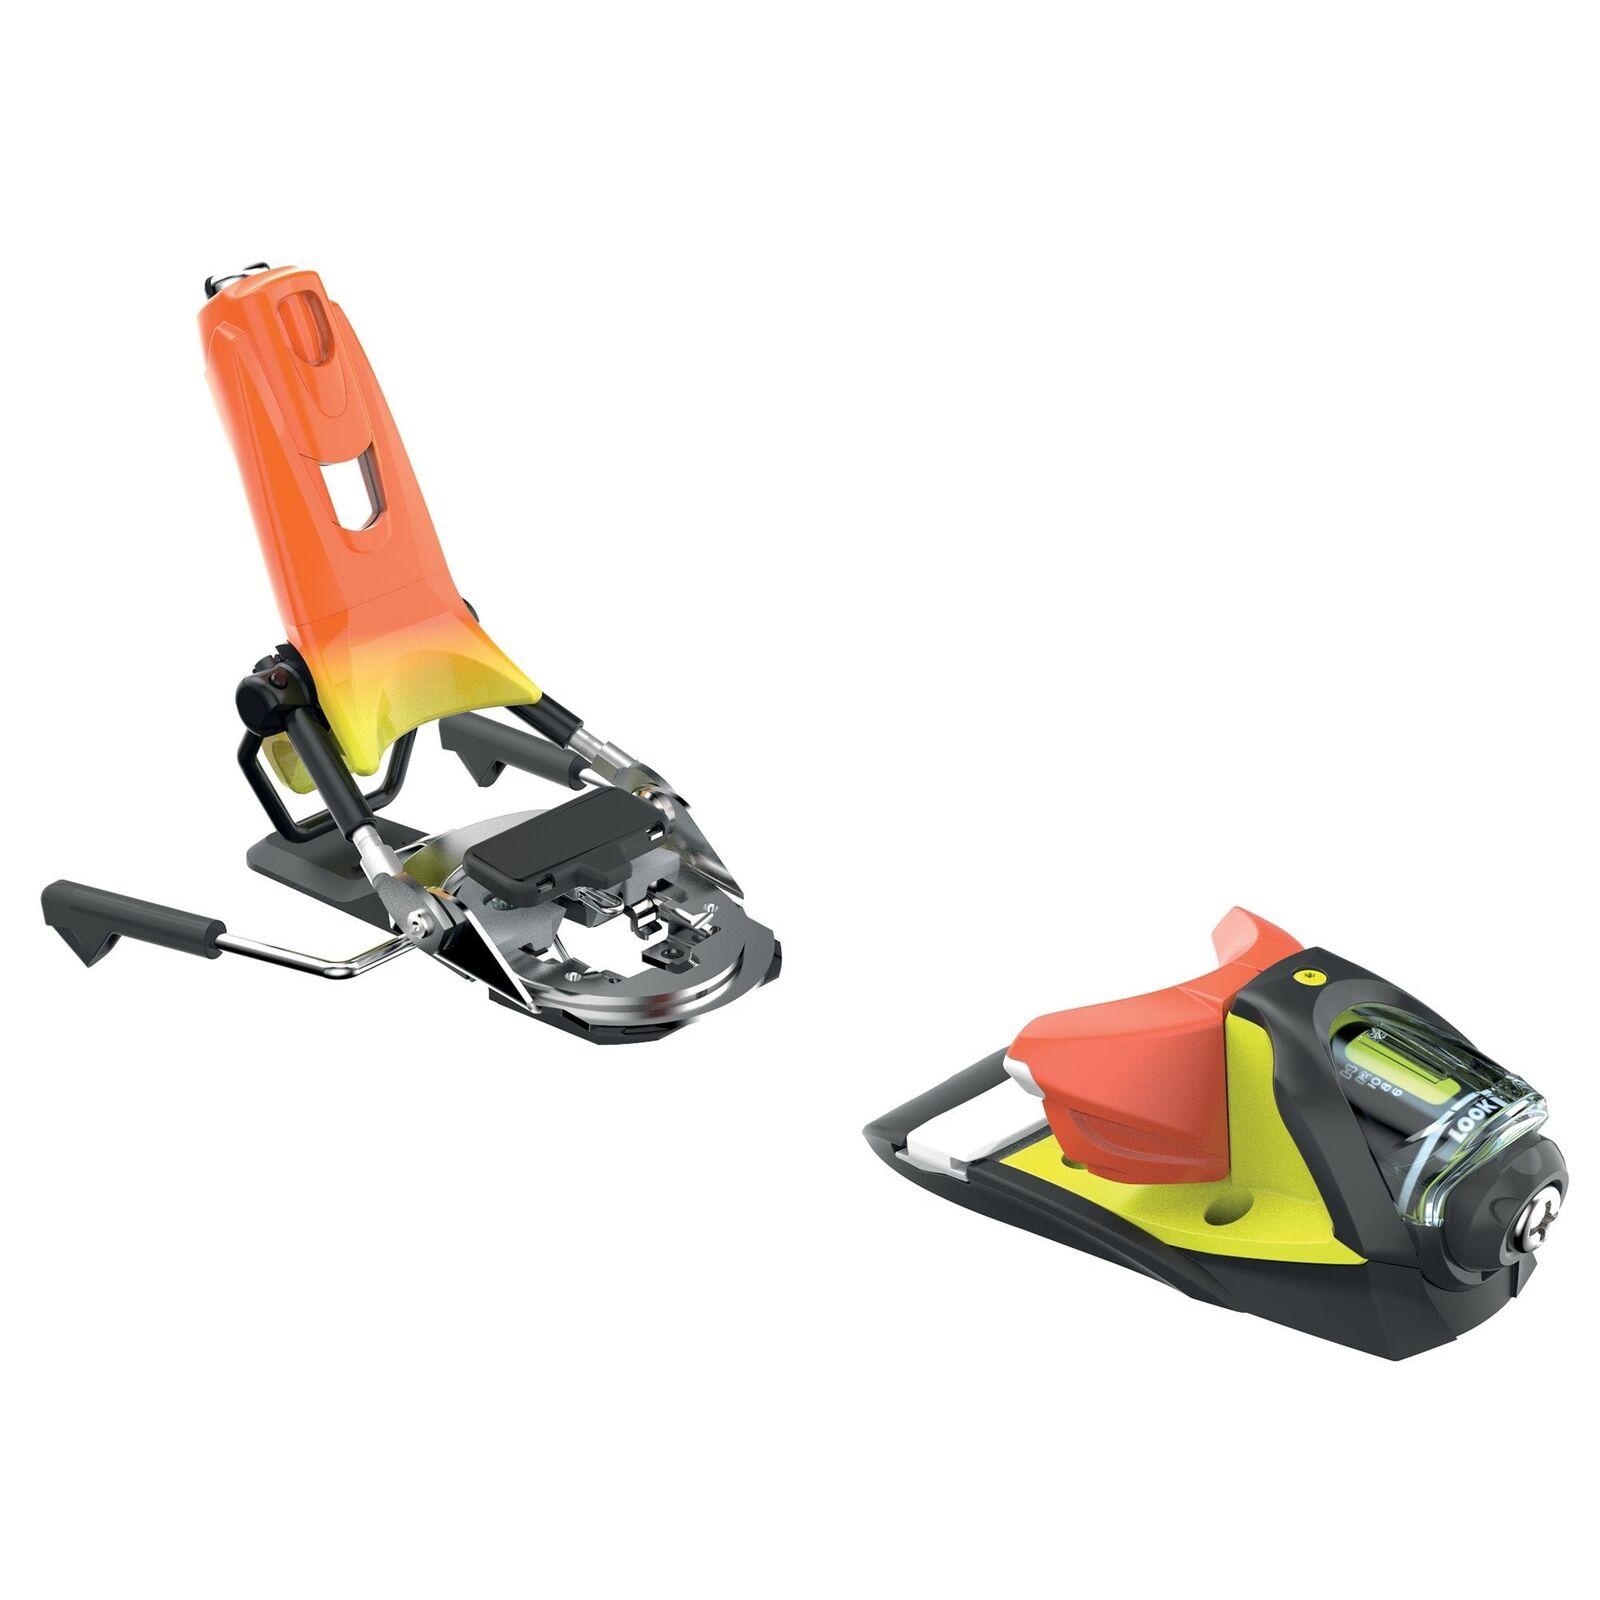 Dynastar - Look Look Pivot 14 Ski Bindings - Forza